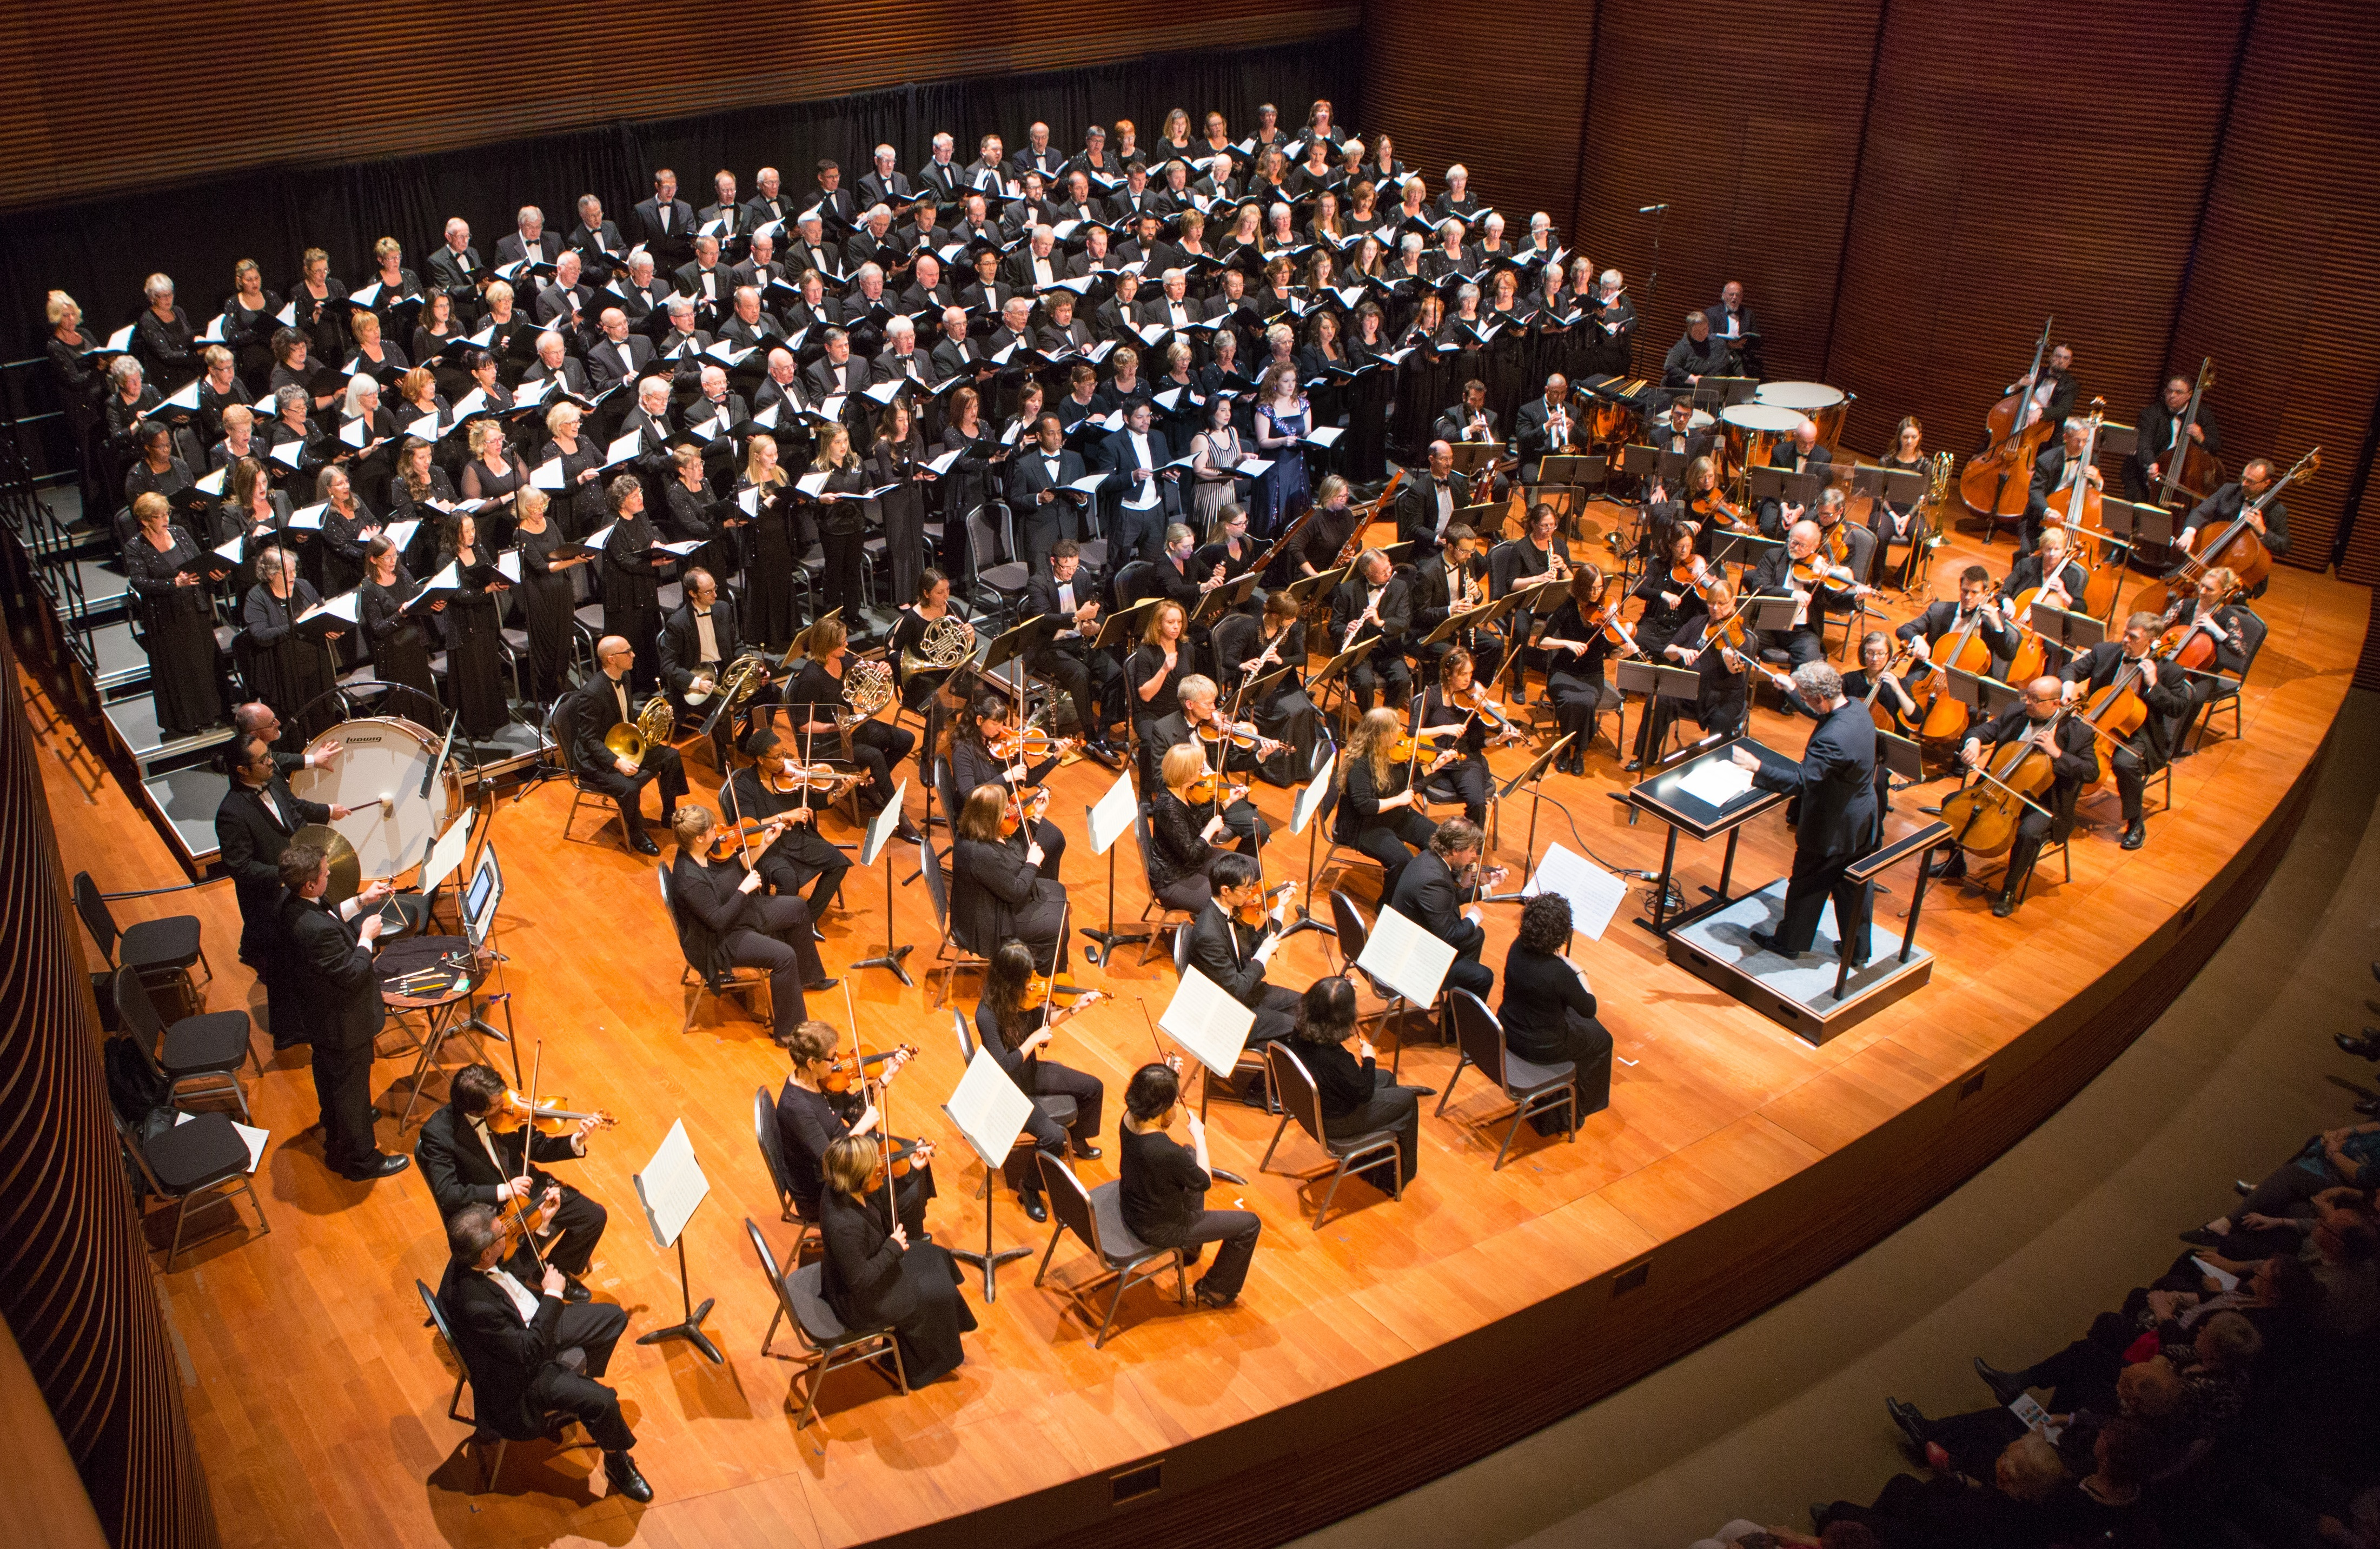 La chorale de Niagara avec l'Orchestre symphonique de Niagara sur scène